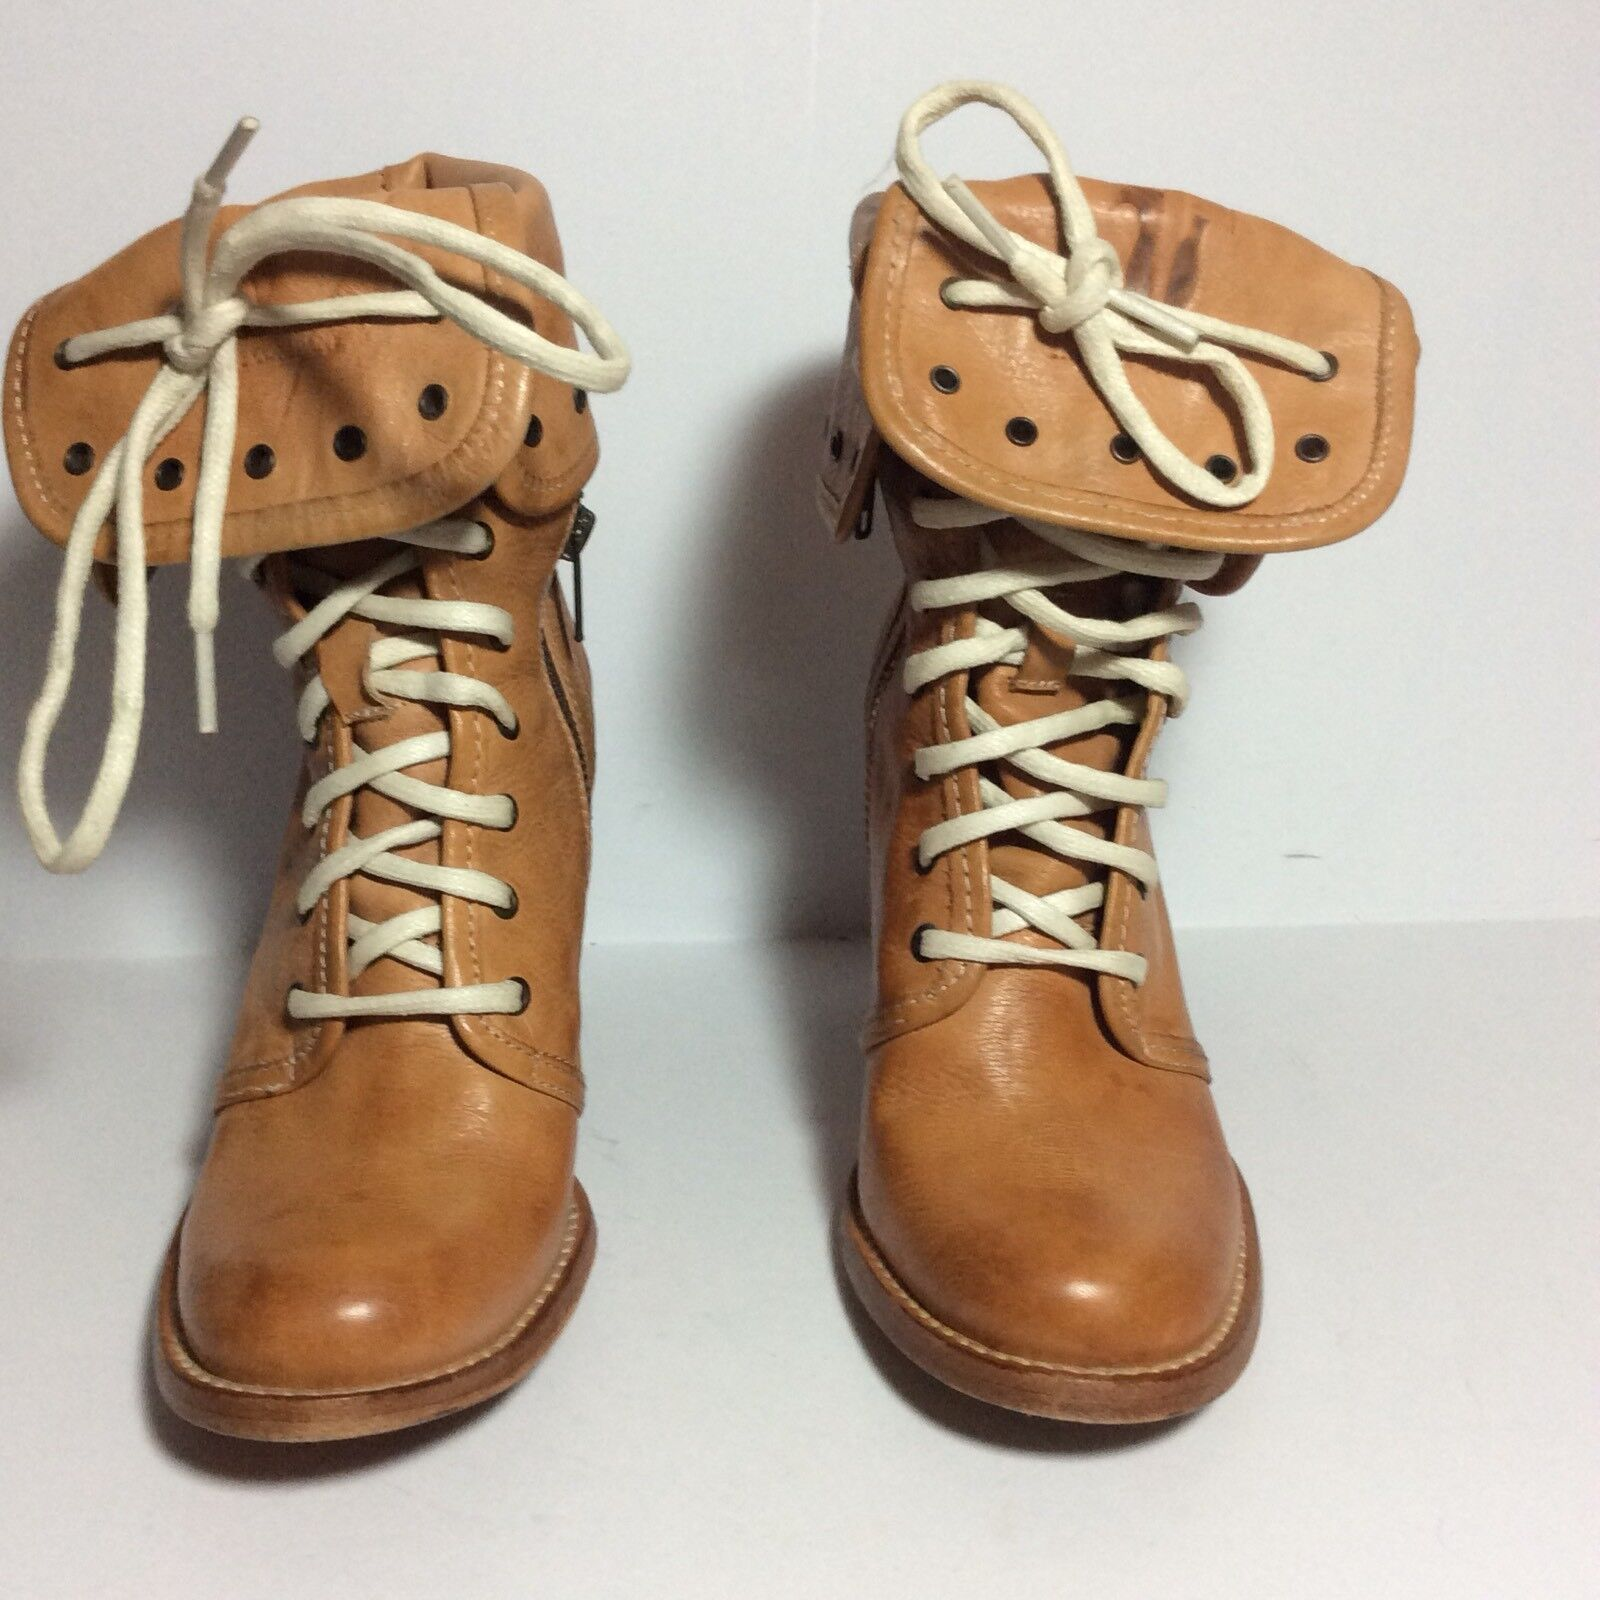 Frye 298 Julia Grommet Lace Ankle Boots Sz 6B Tan GUC HTF